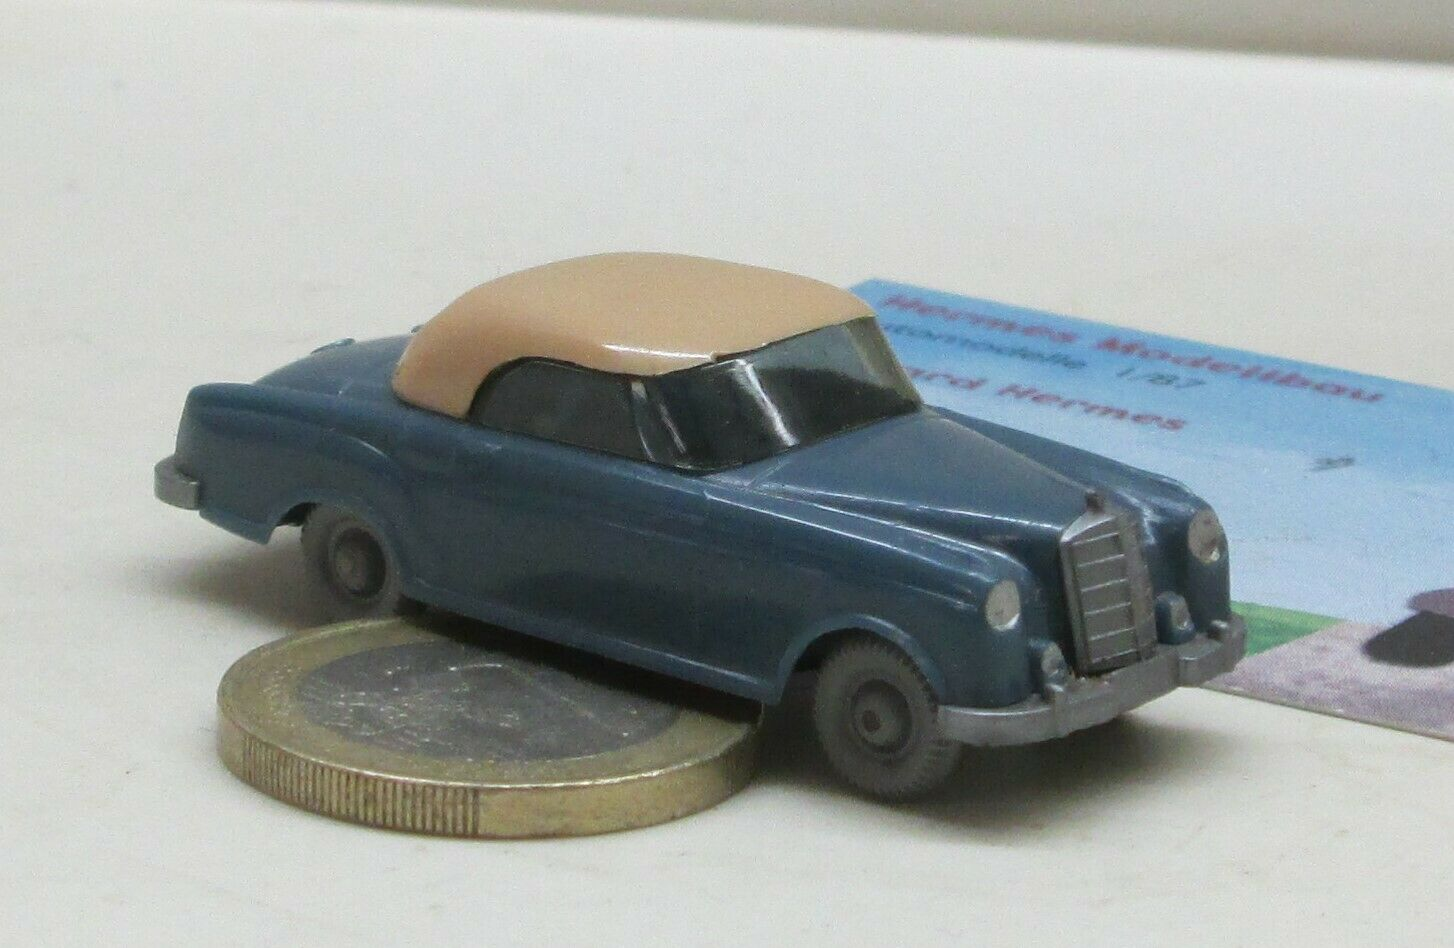 promociones Wiking 144-2b 144-2b 144-2b  mercedes 220 Coupe '55, H 'Azur beige (1077)  venta mundialmente famosa en línea